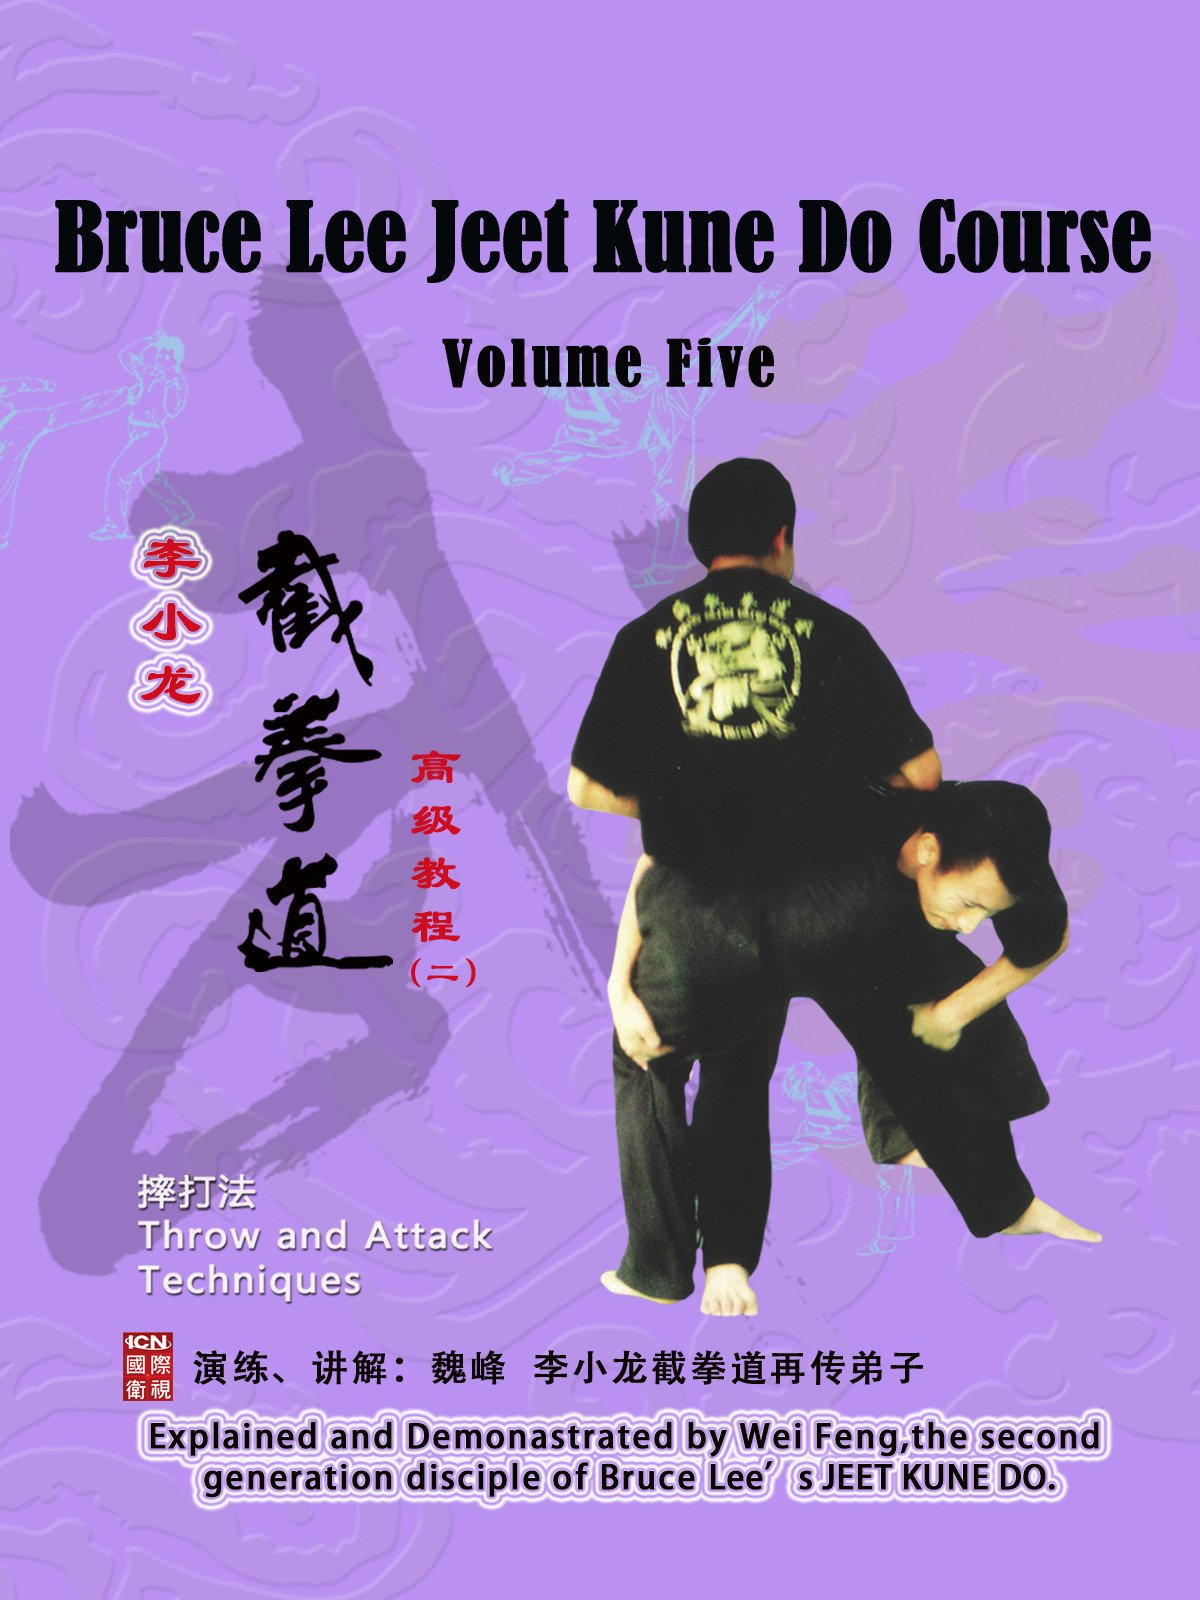 Bruce Lee Jeet Kune Do Course Volume Five